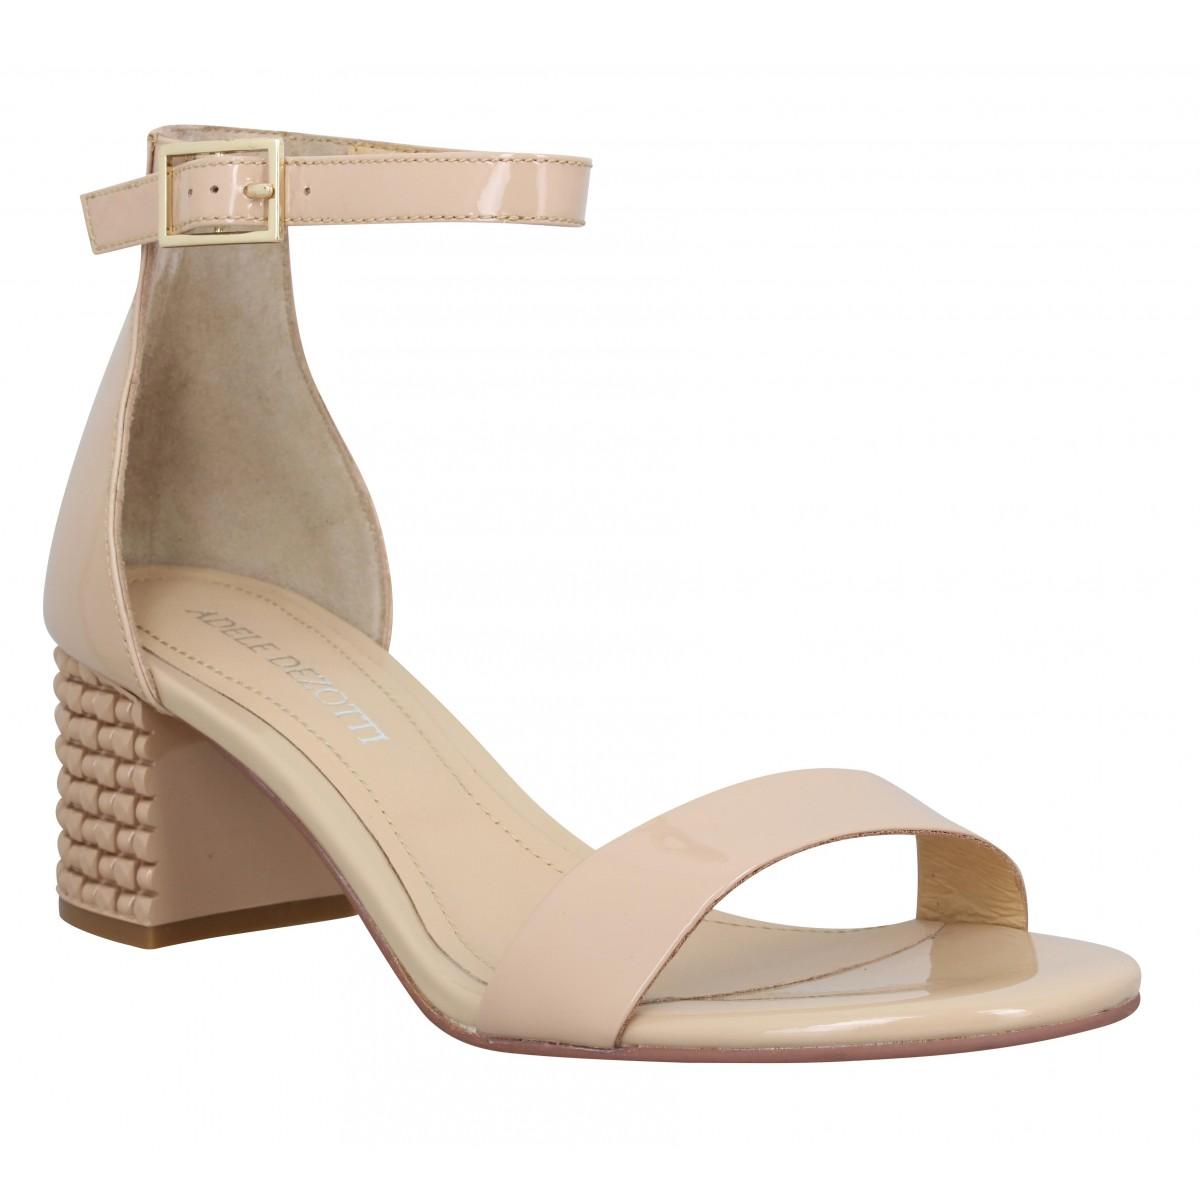 1302 Adele Vernis Chaussures Femme Dezotti NudeFanny 3c5K1JuTlF